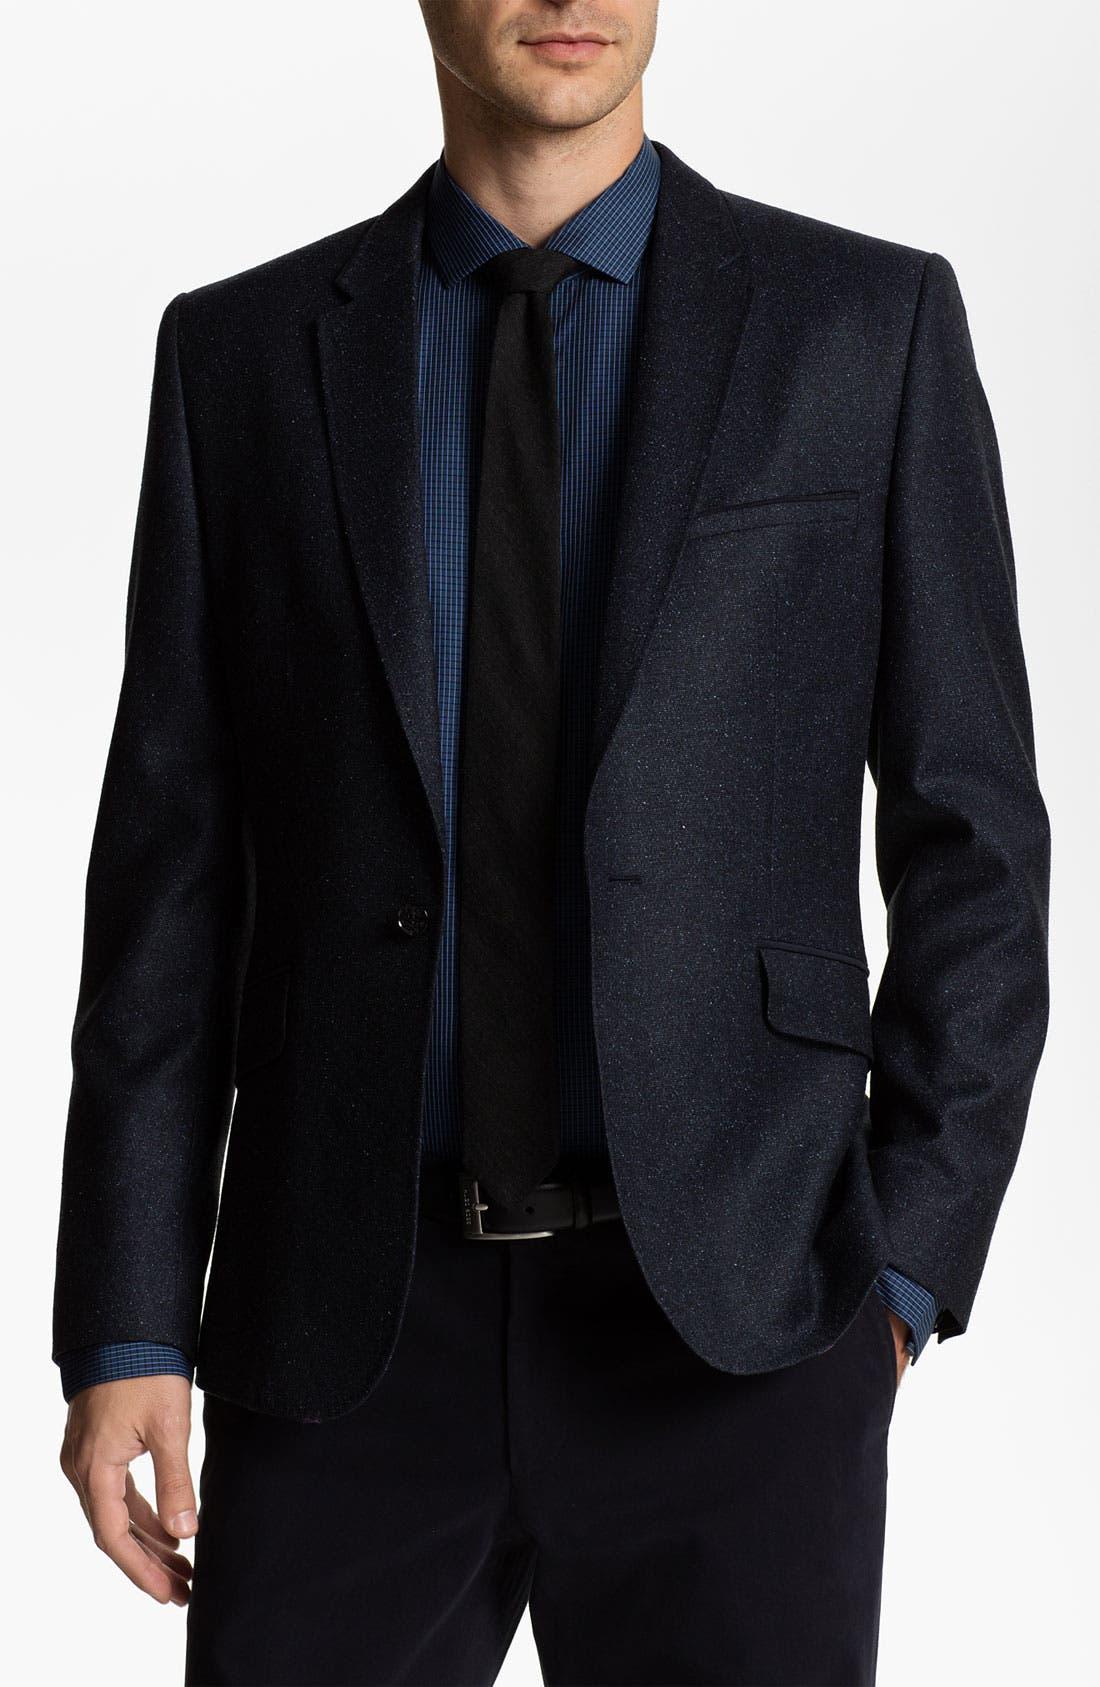 Alternate Image 1 Selected - Ted Baker London Trim Fit Donegal Tweed Blazer